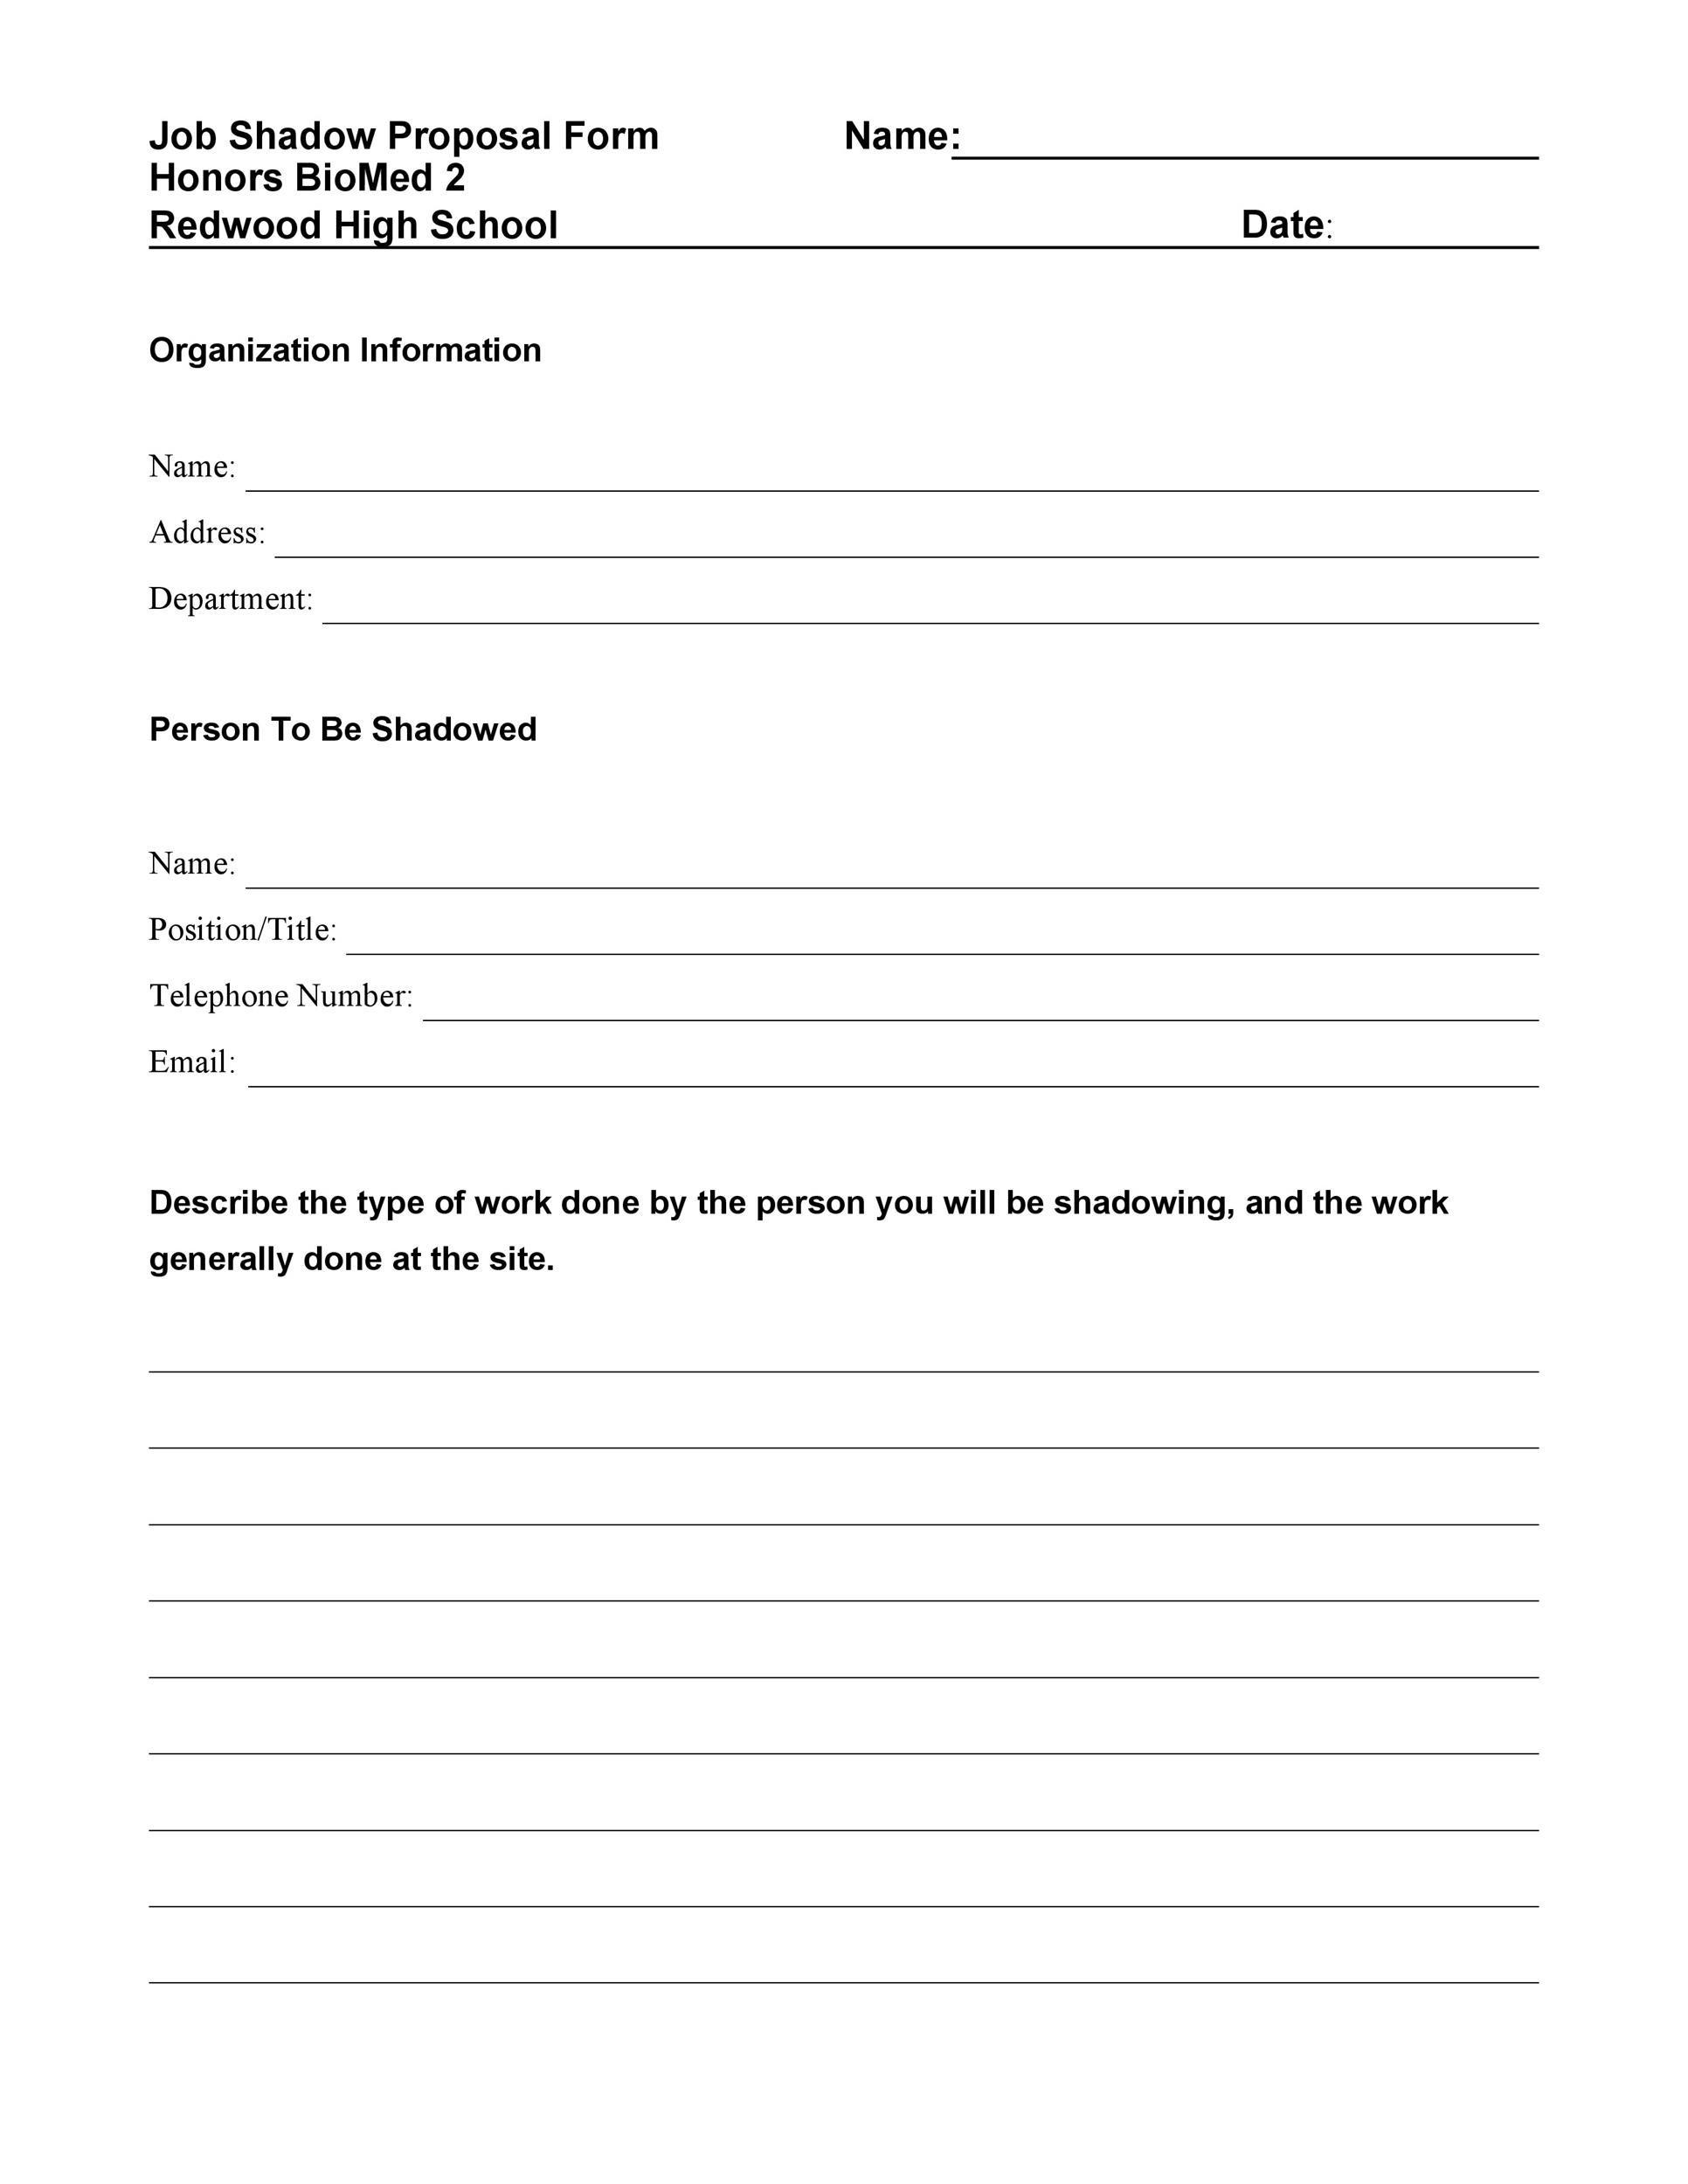 Free Job Proposal Template 17